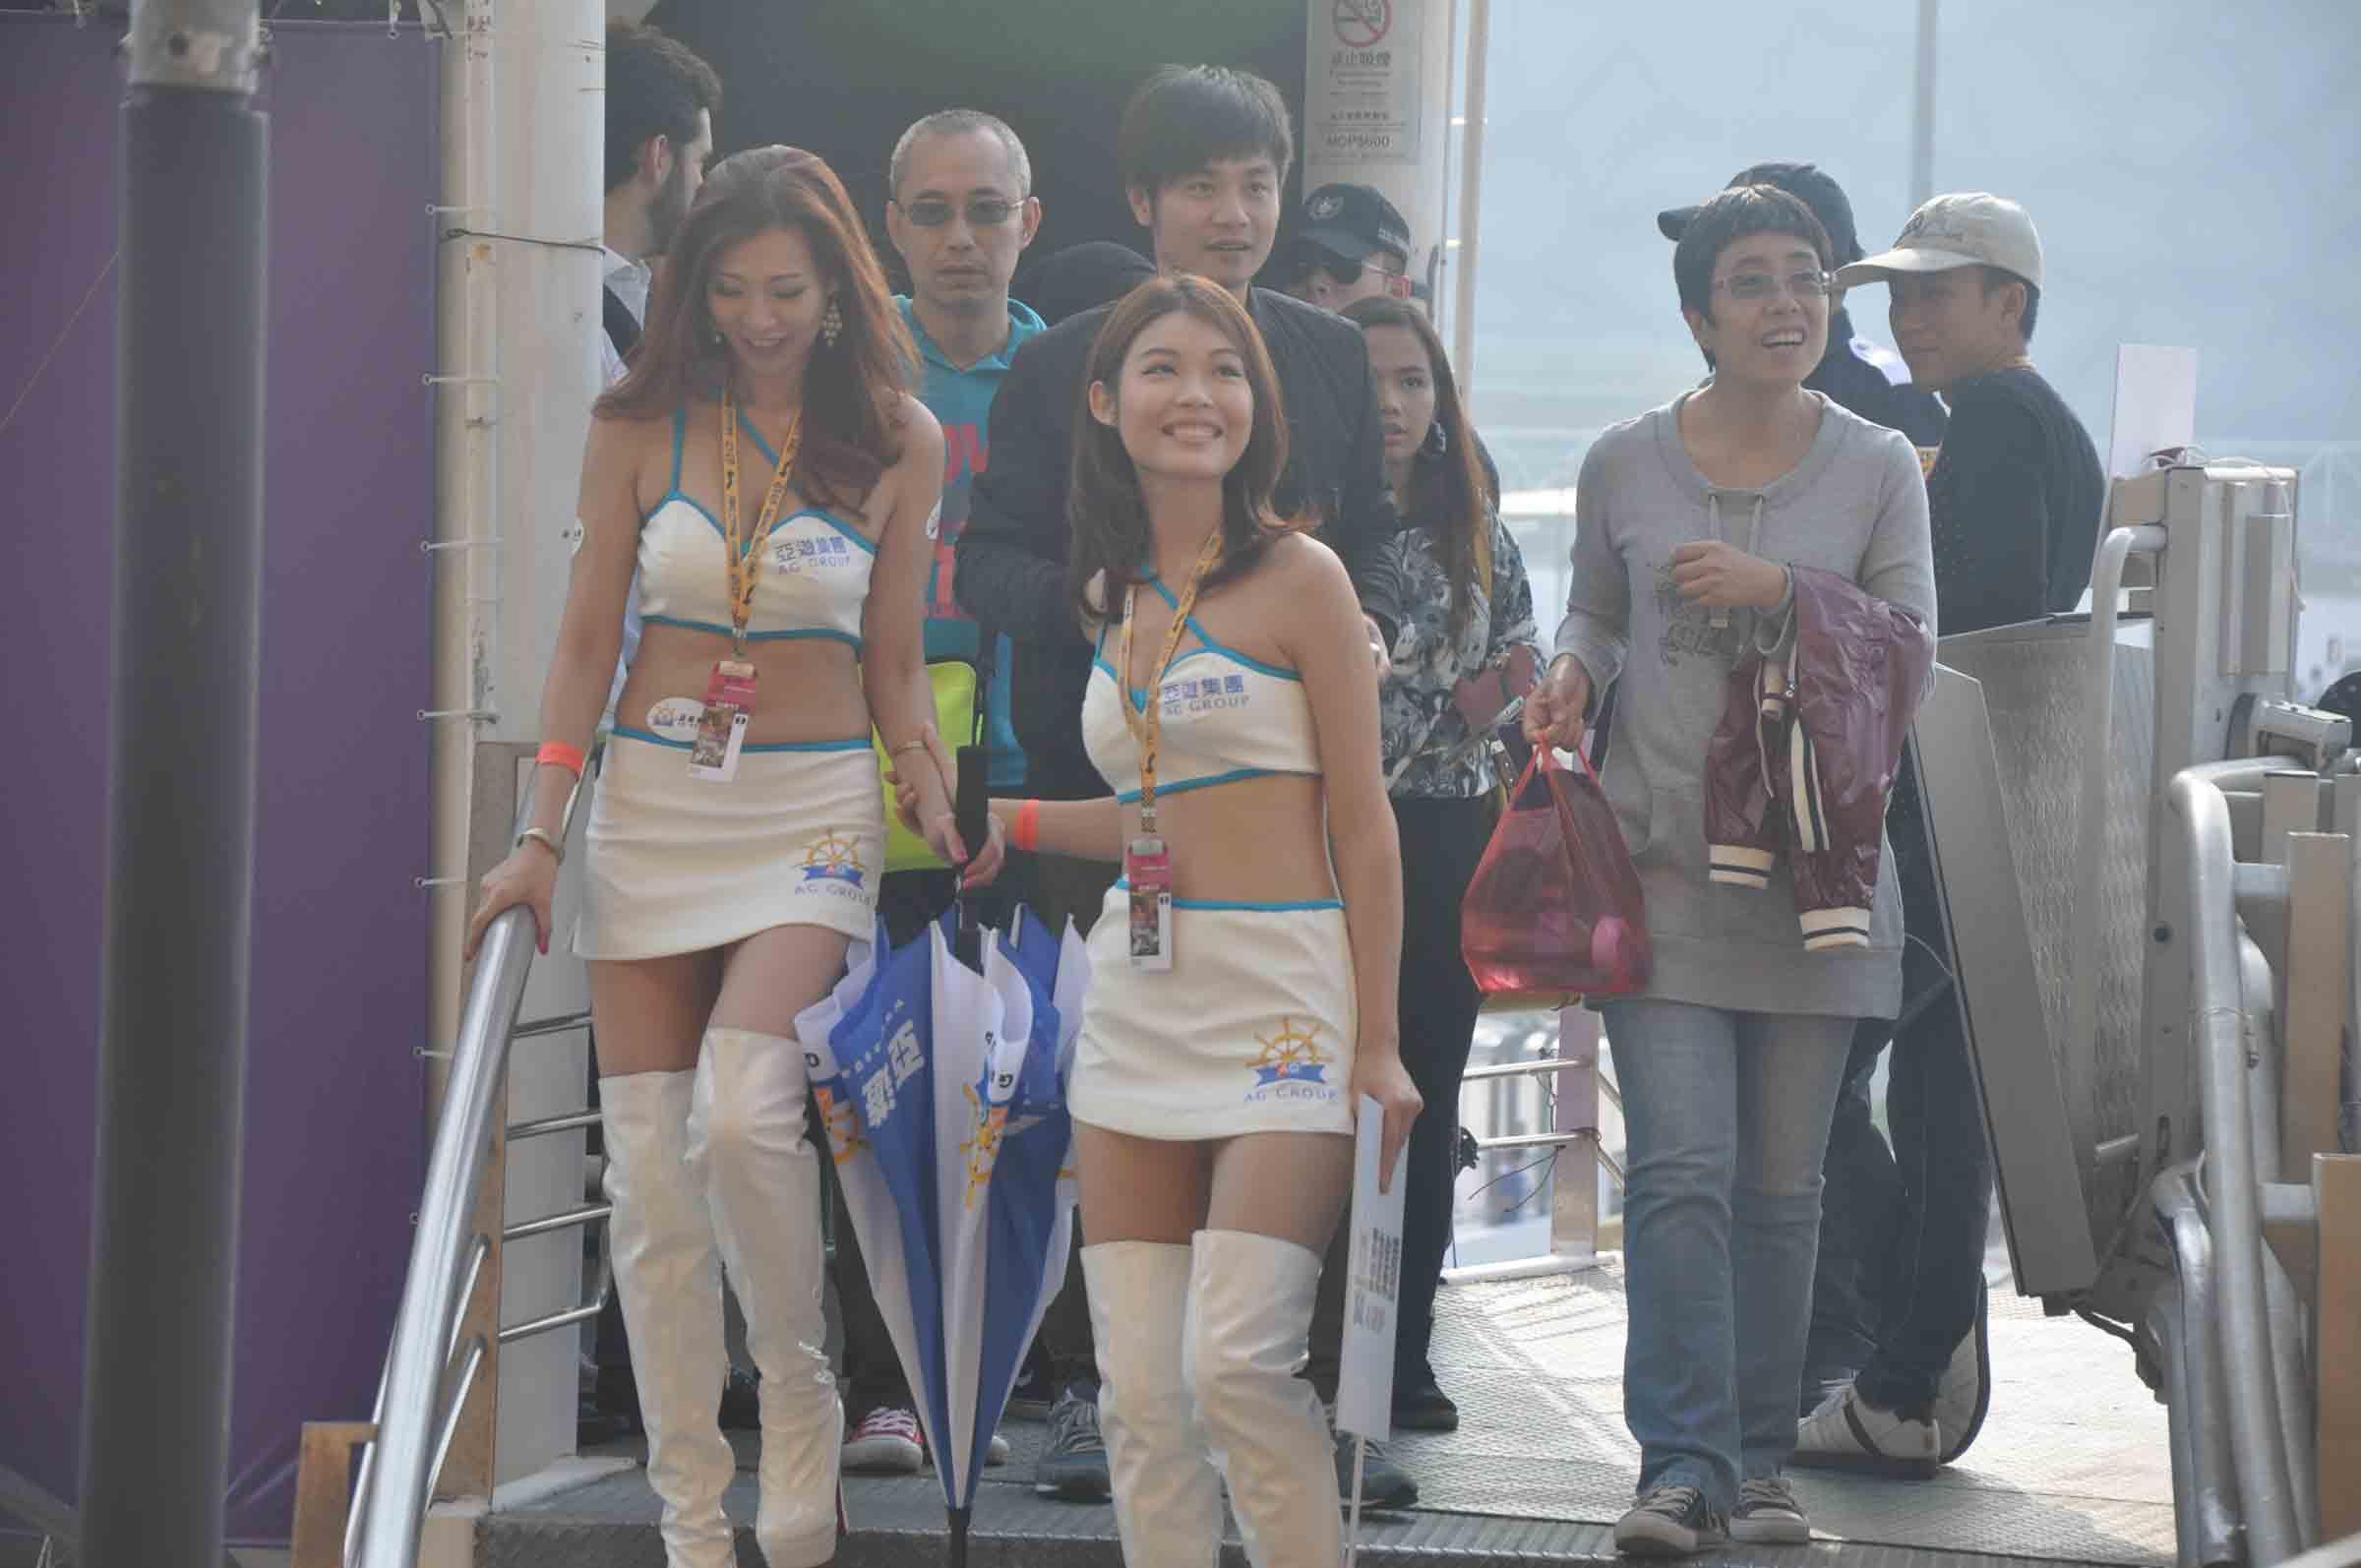 Macau F3 Grand Prix Race hot race girls